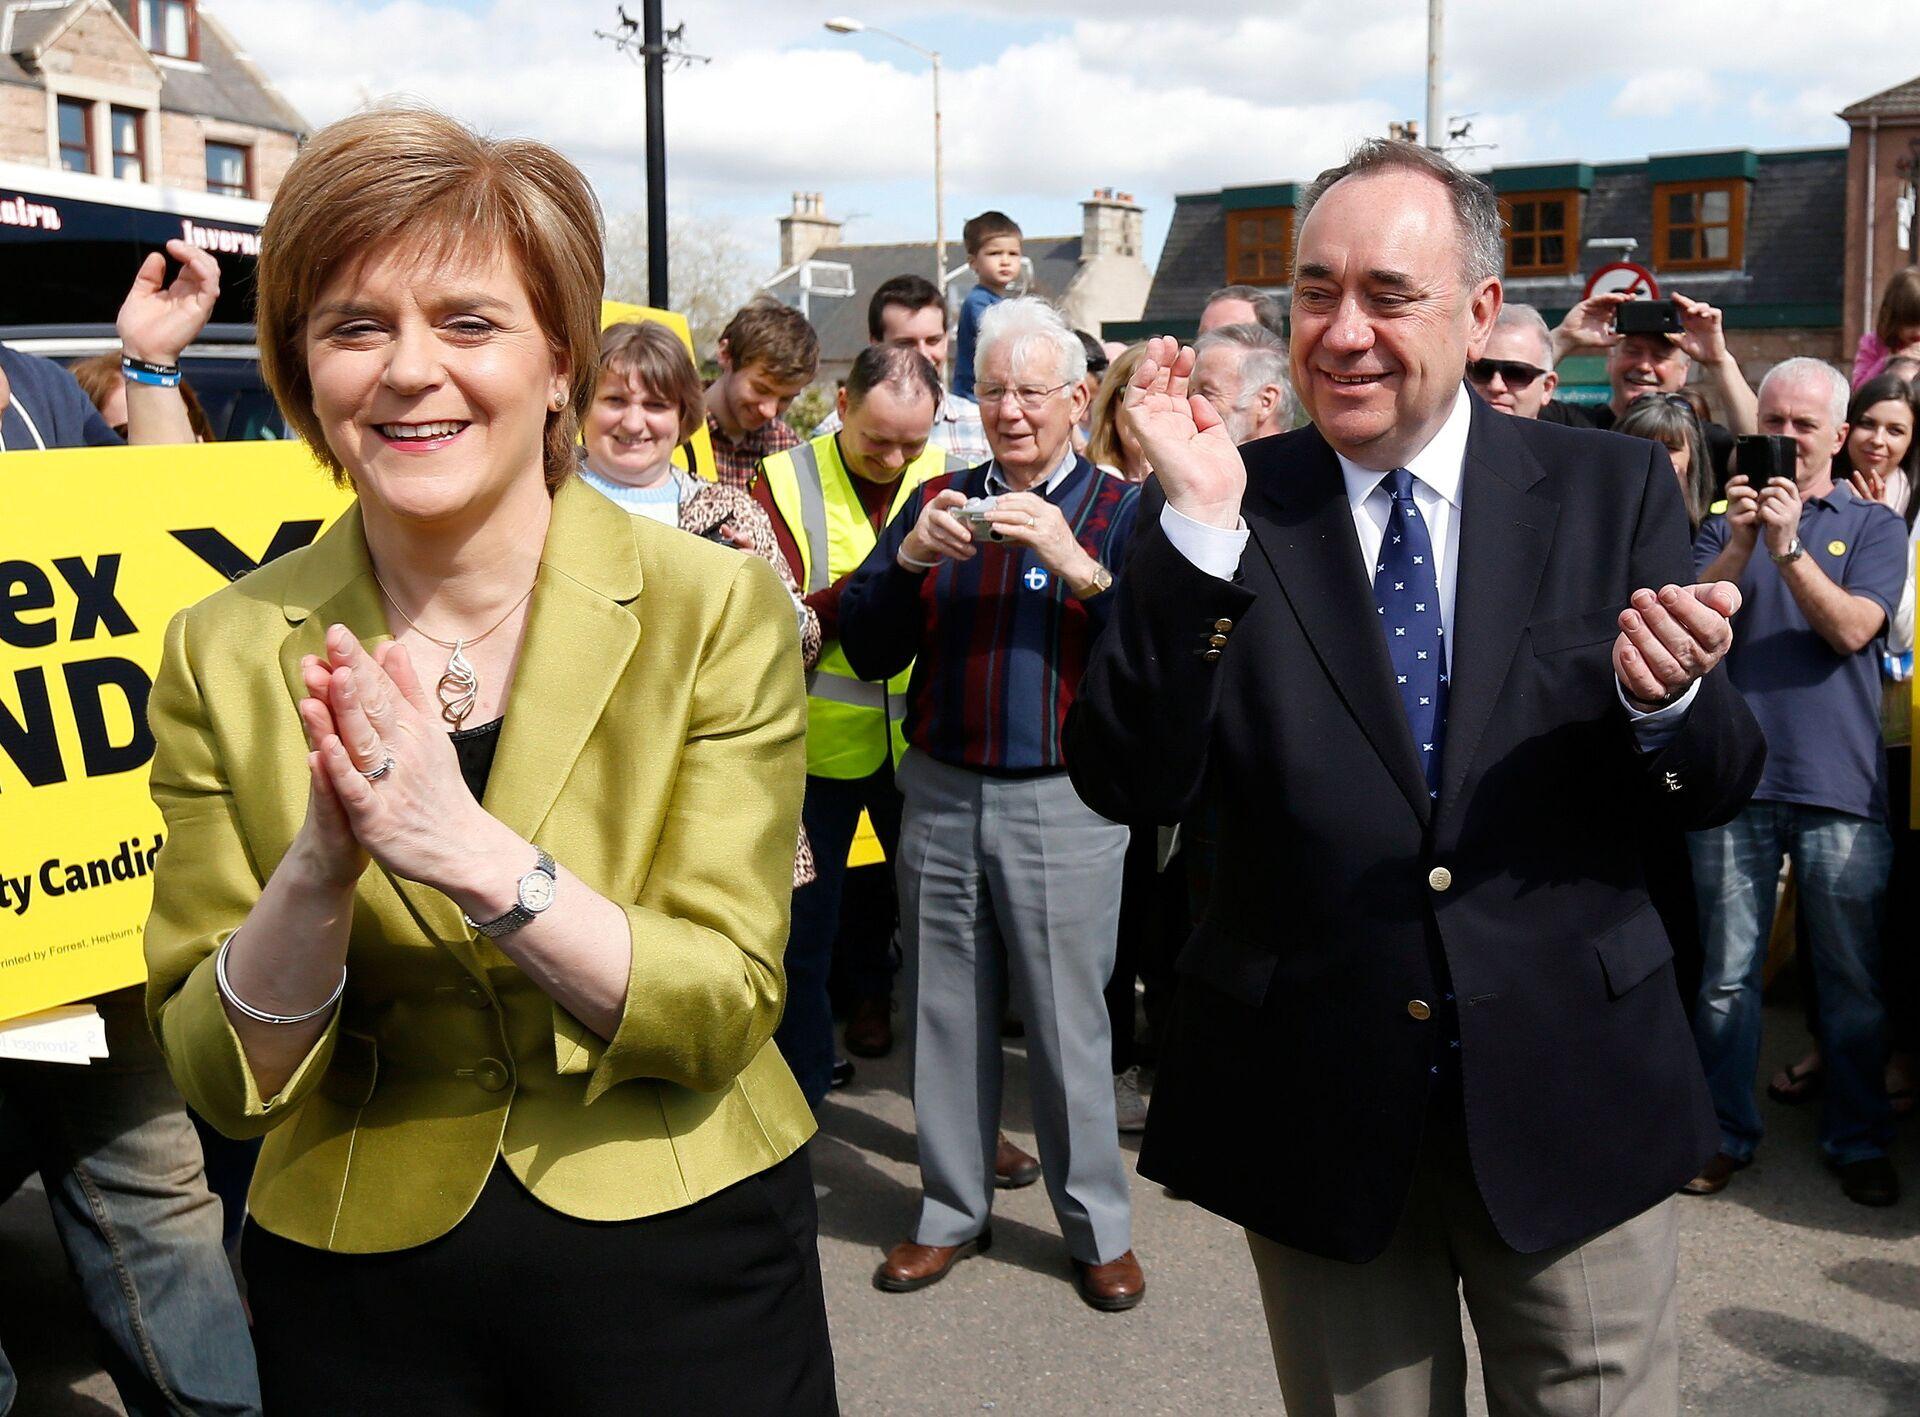 Salmond Says Scottish Nationalist Majority Could Seek 'Legal Action' if Westminster Rejects IndyRef2 - Sputnik International, 1920, 28.03.2021